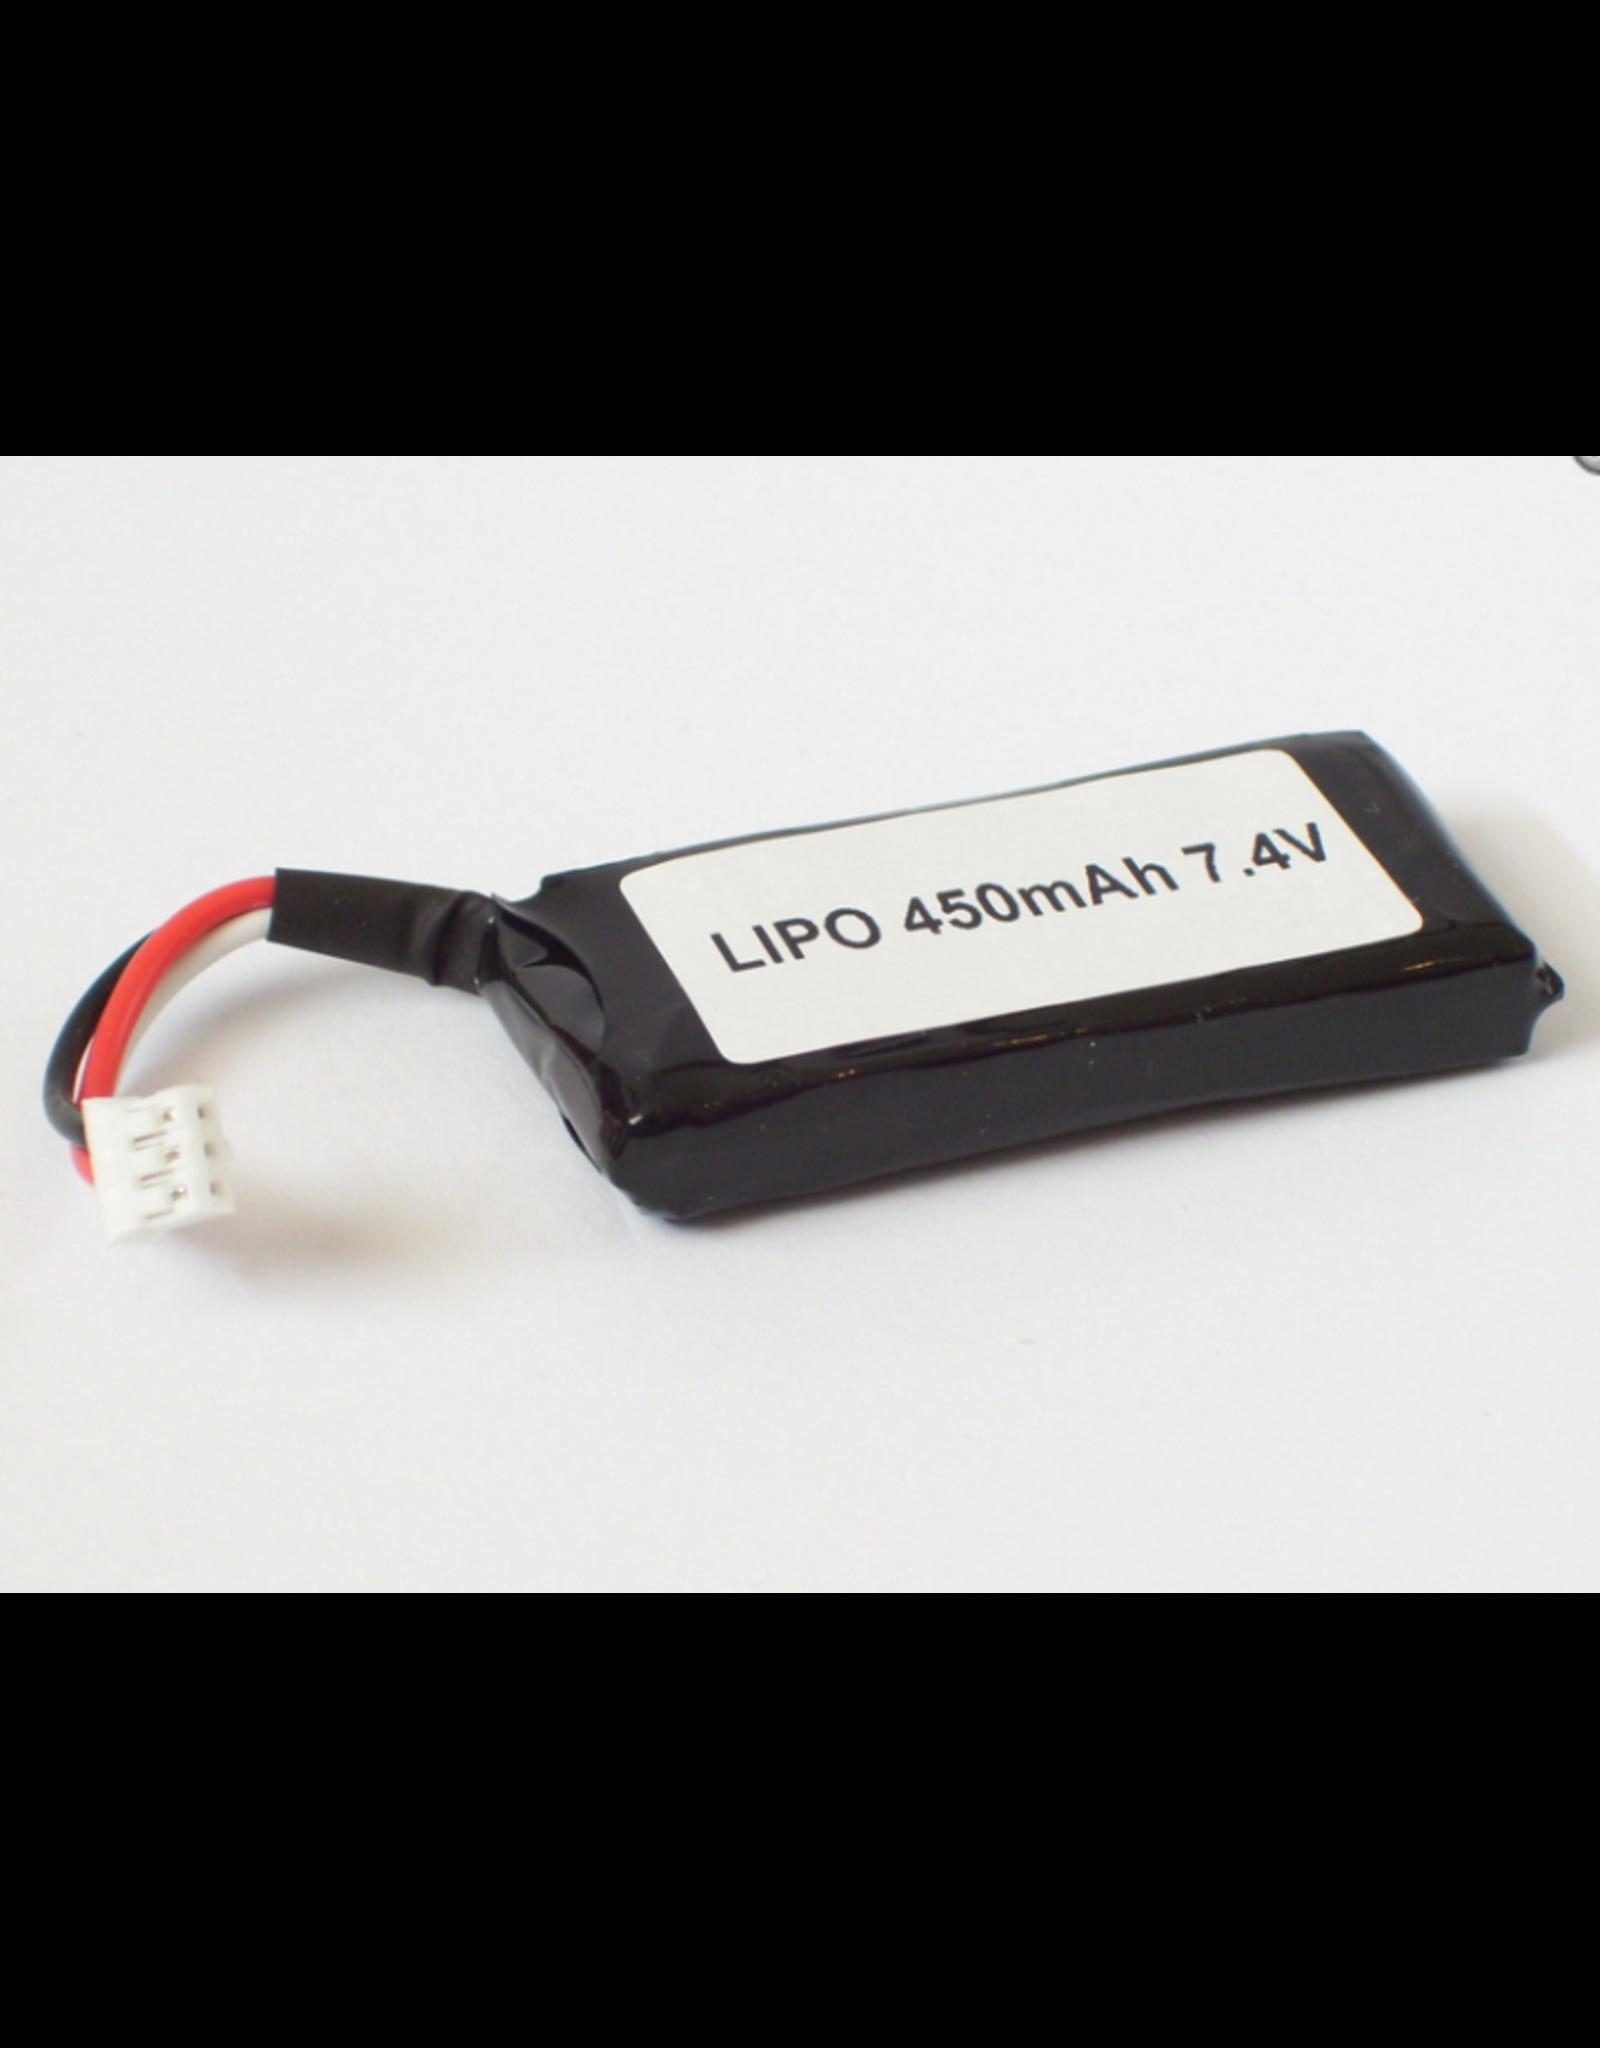 PN Racing JOMUREMA 2S / 7.4V / 25C / 420mAh Lipo Battery